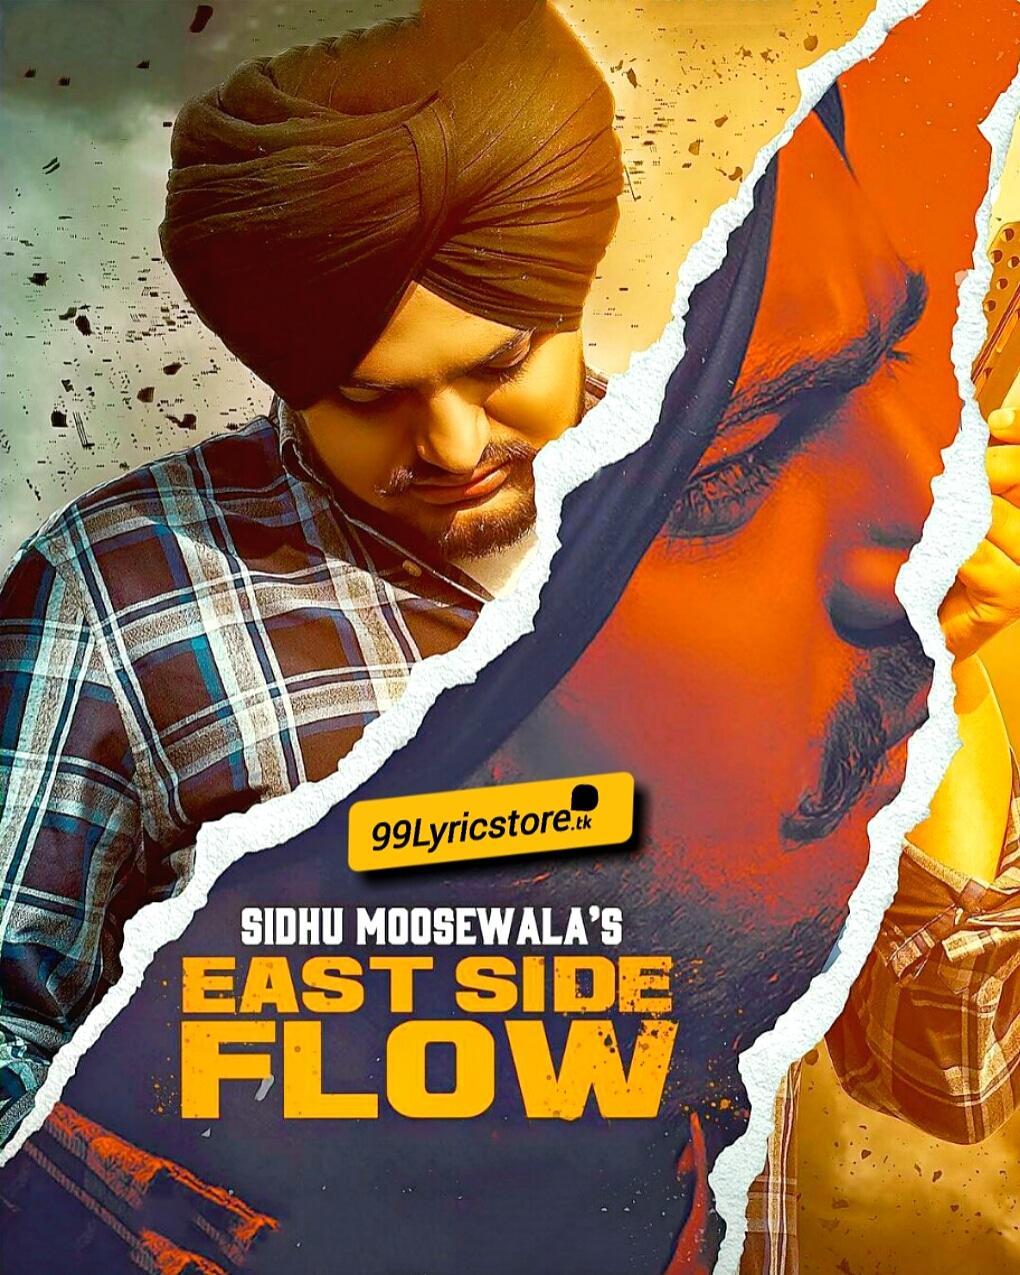 East side flow punjabi song lyrics sung by Sidhu Moose Wala